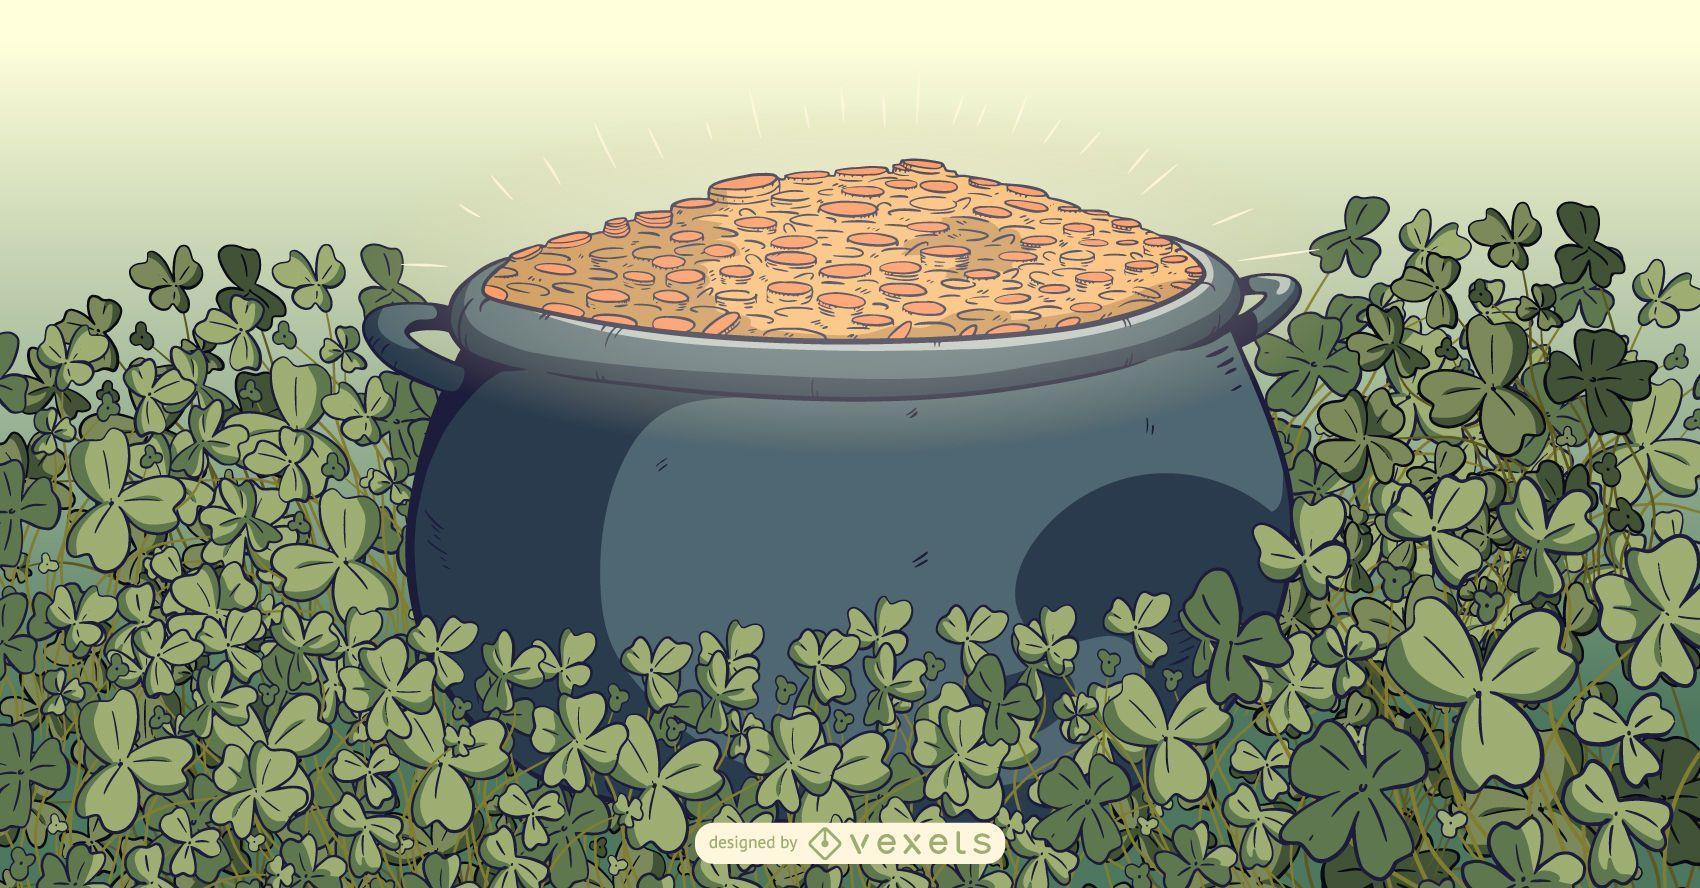 Leprechaun Pot of Gold Illustration